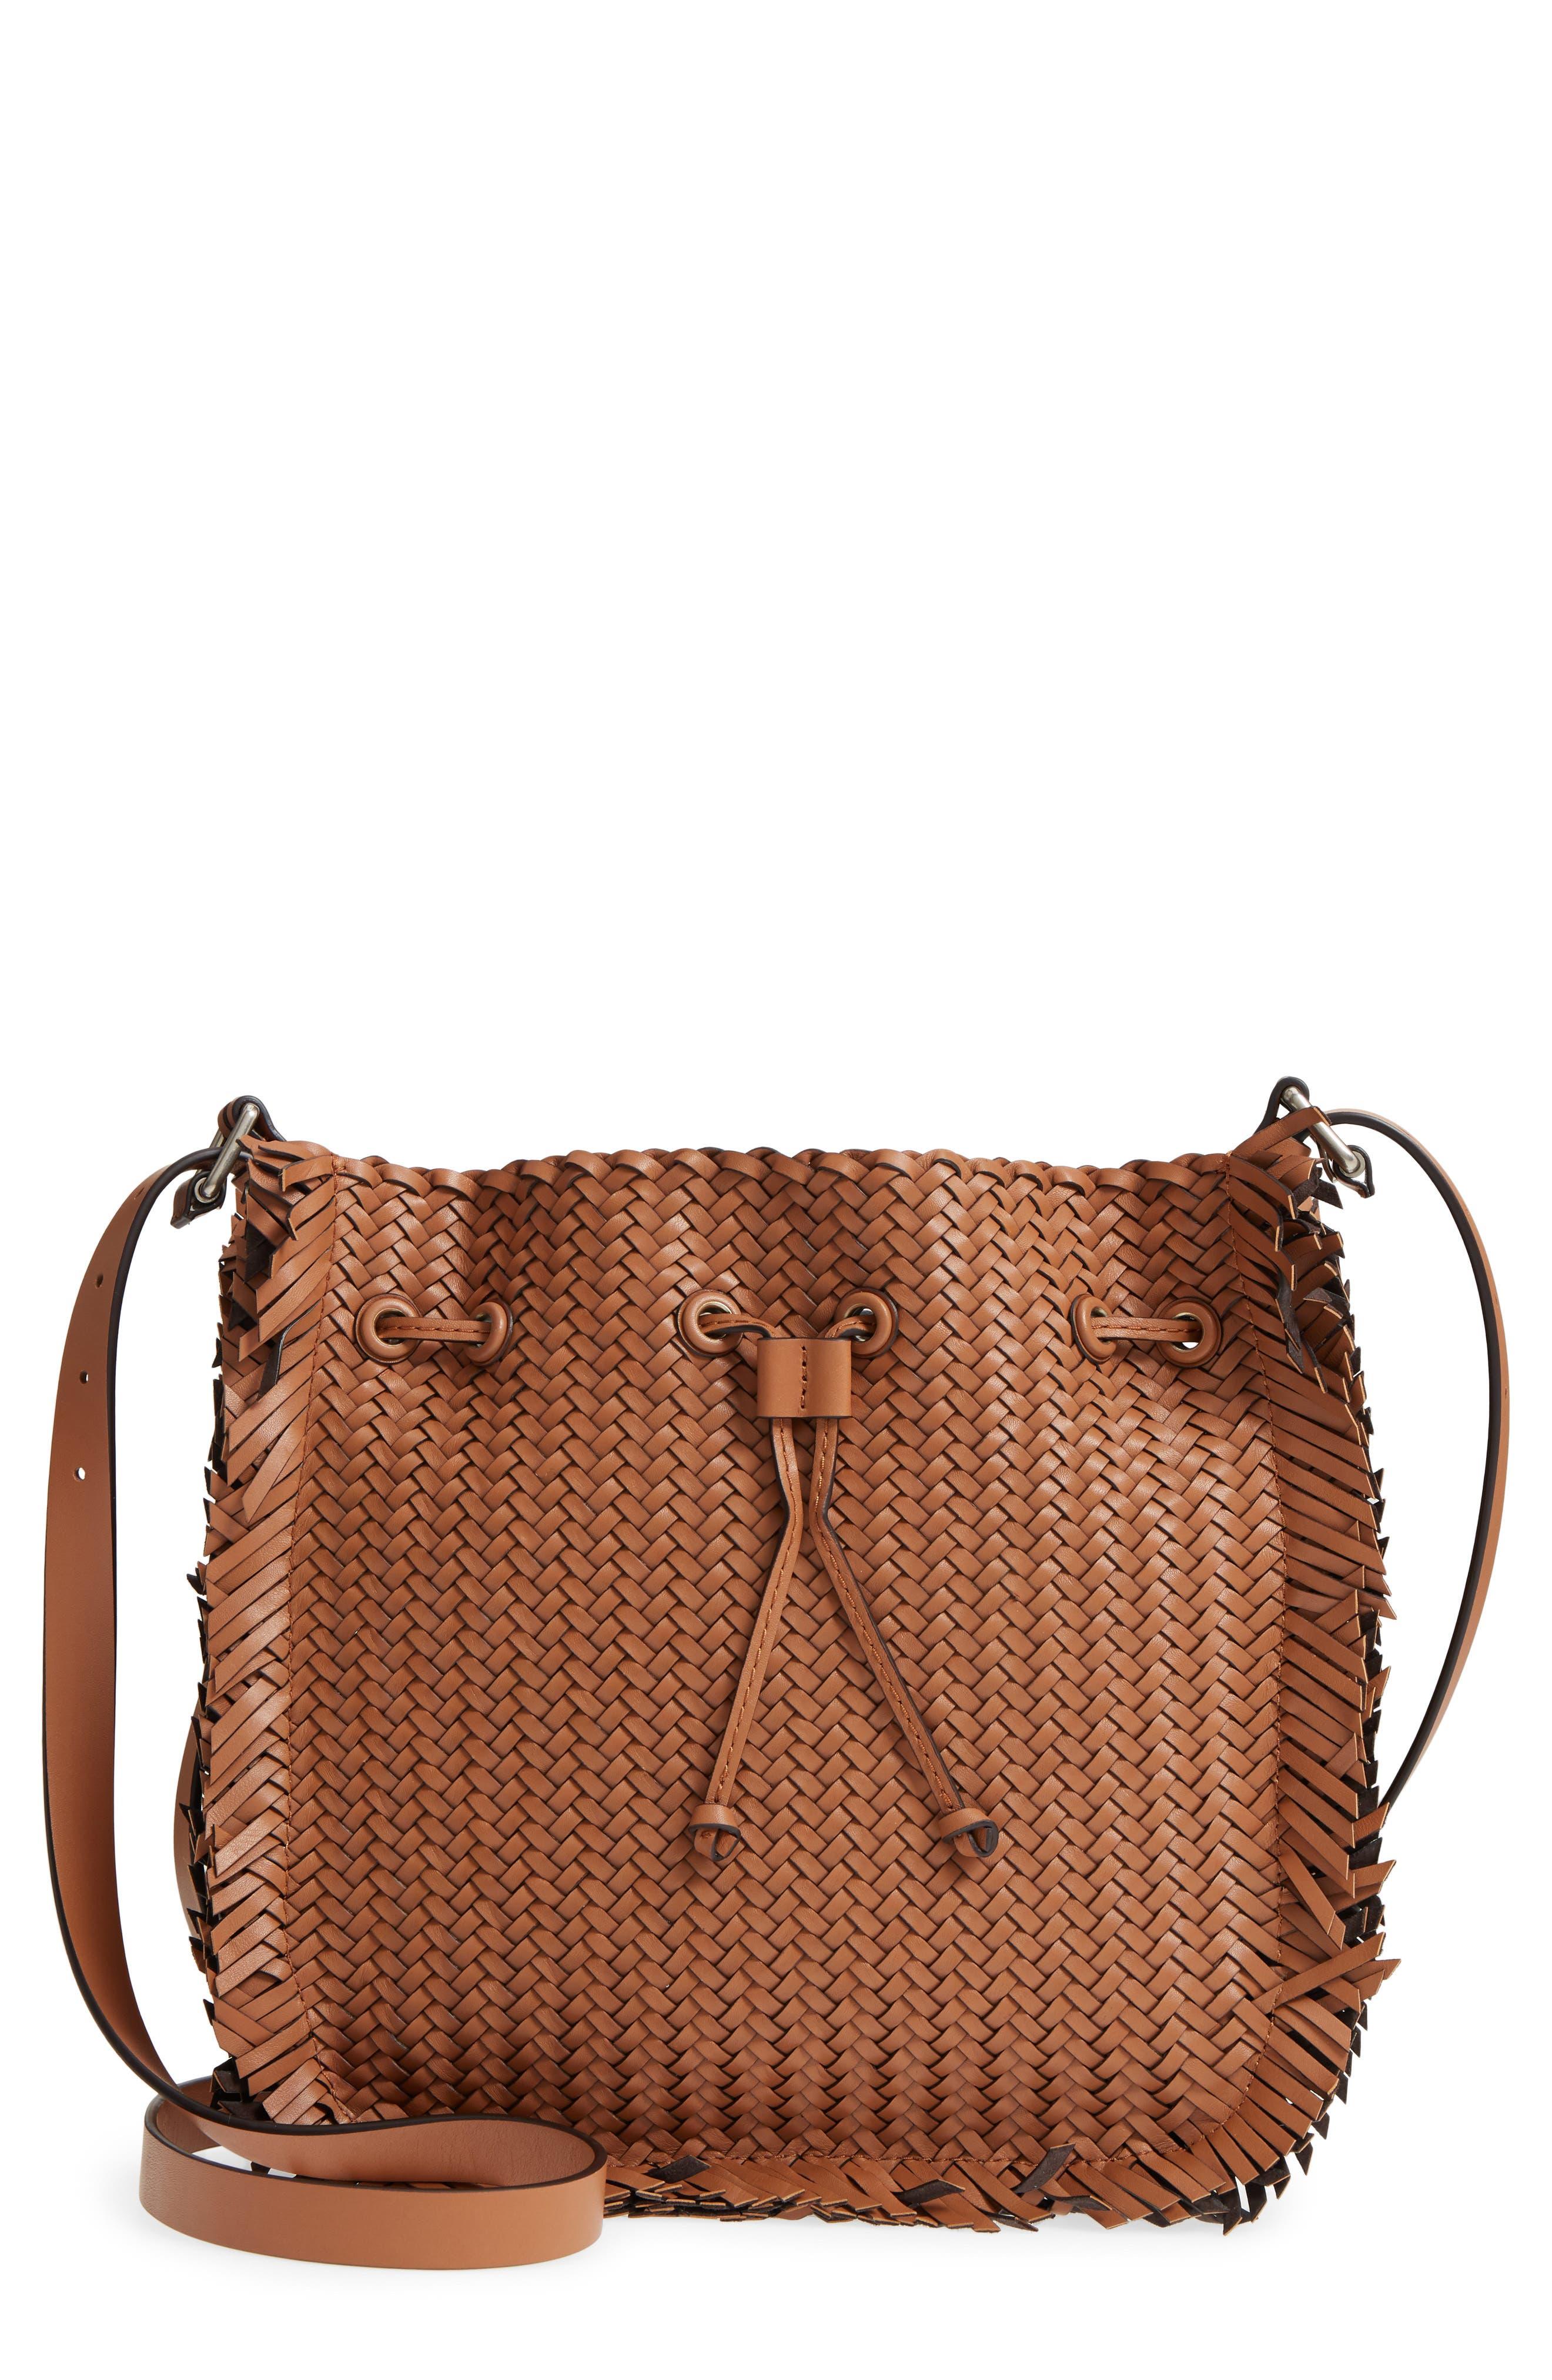 Maldives Woven Frayed Leather Crossbody Bag,                             Main thumbnail 1, color,                             Acorn